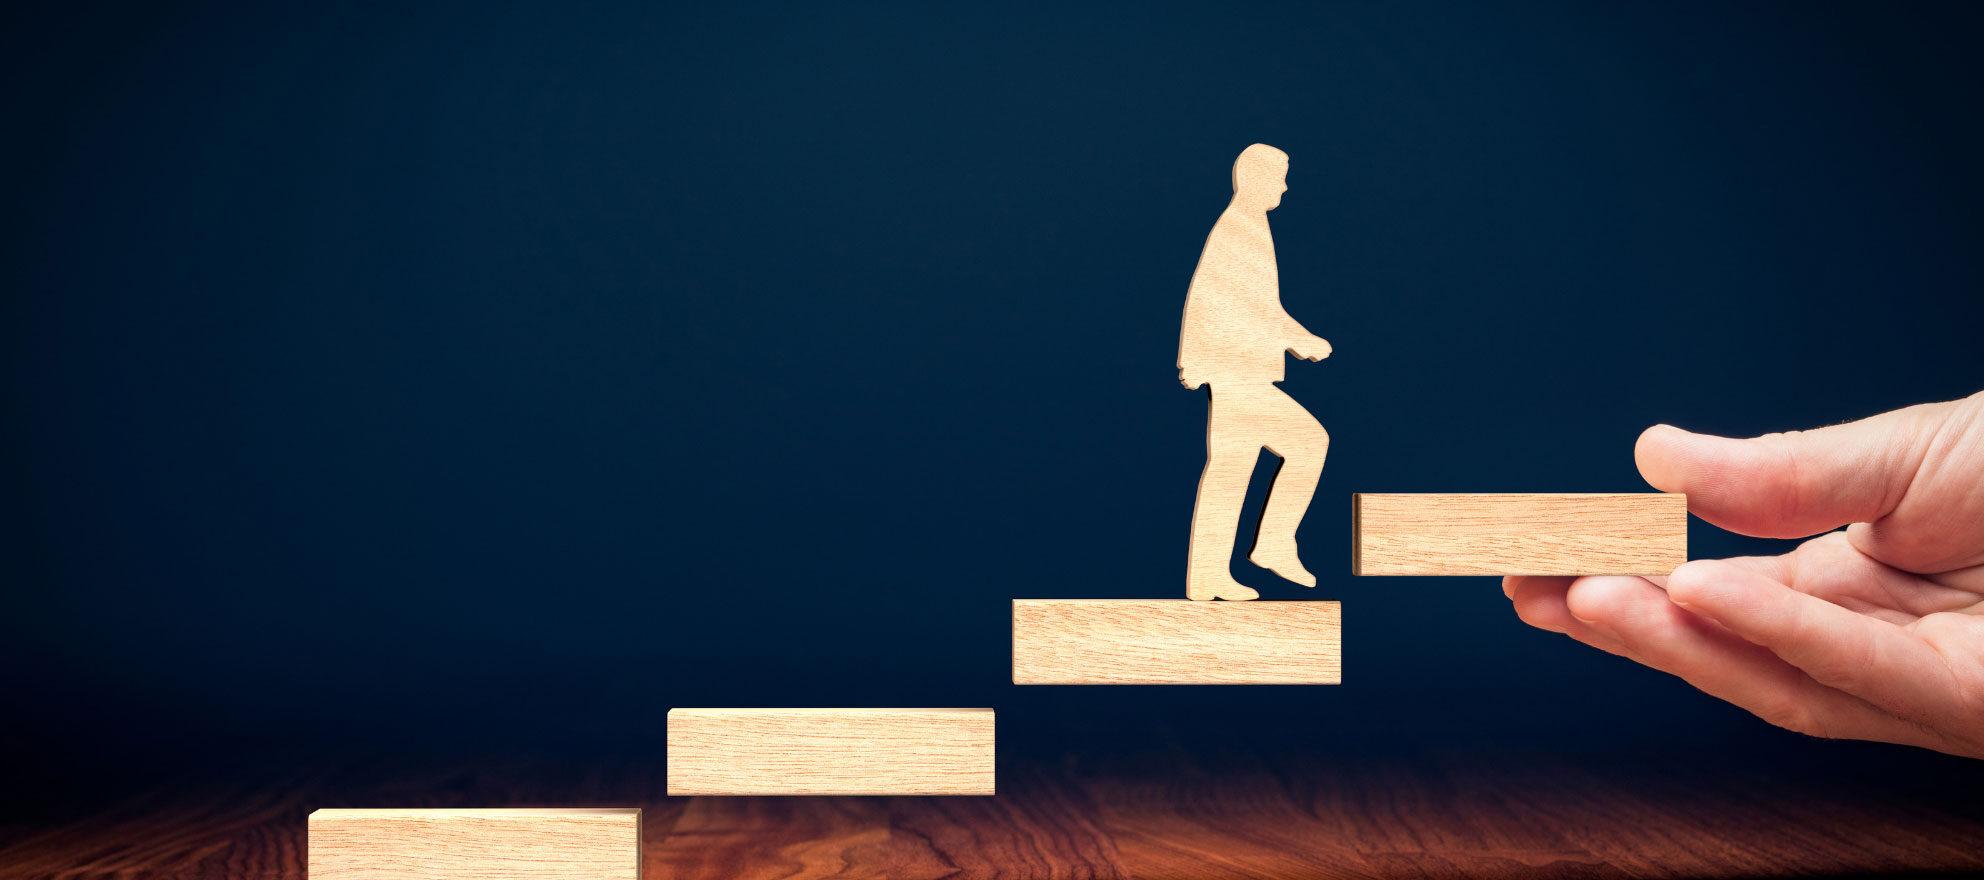 Is real estate coaching broken?